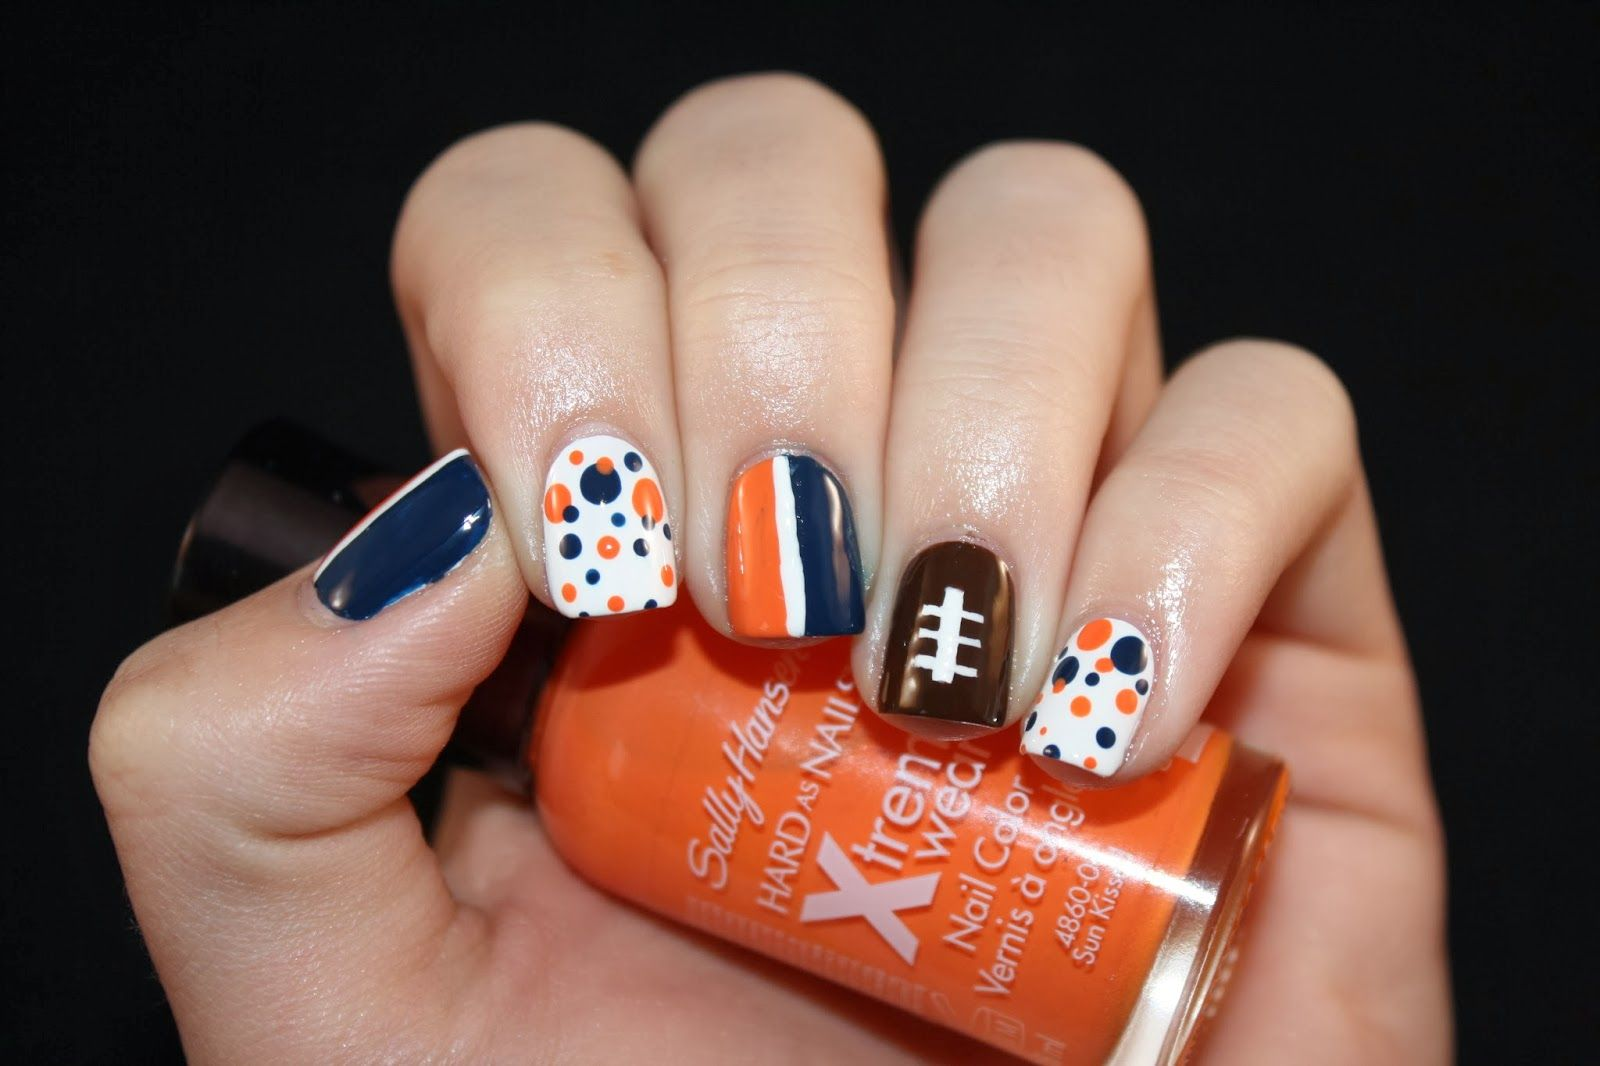 Denver Broncos Nails!   Nails   Pinterest   Denver broncos nails and ...